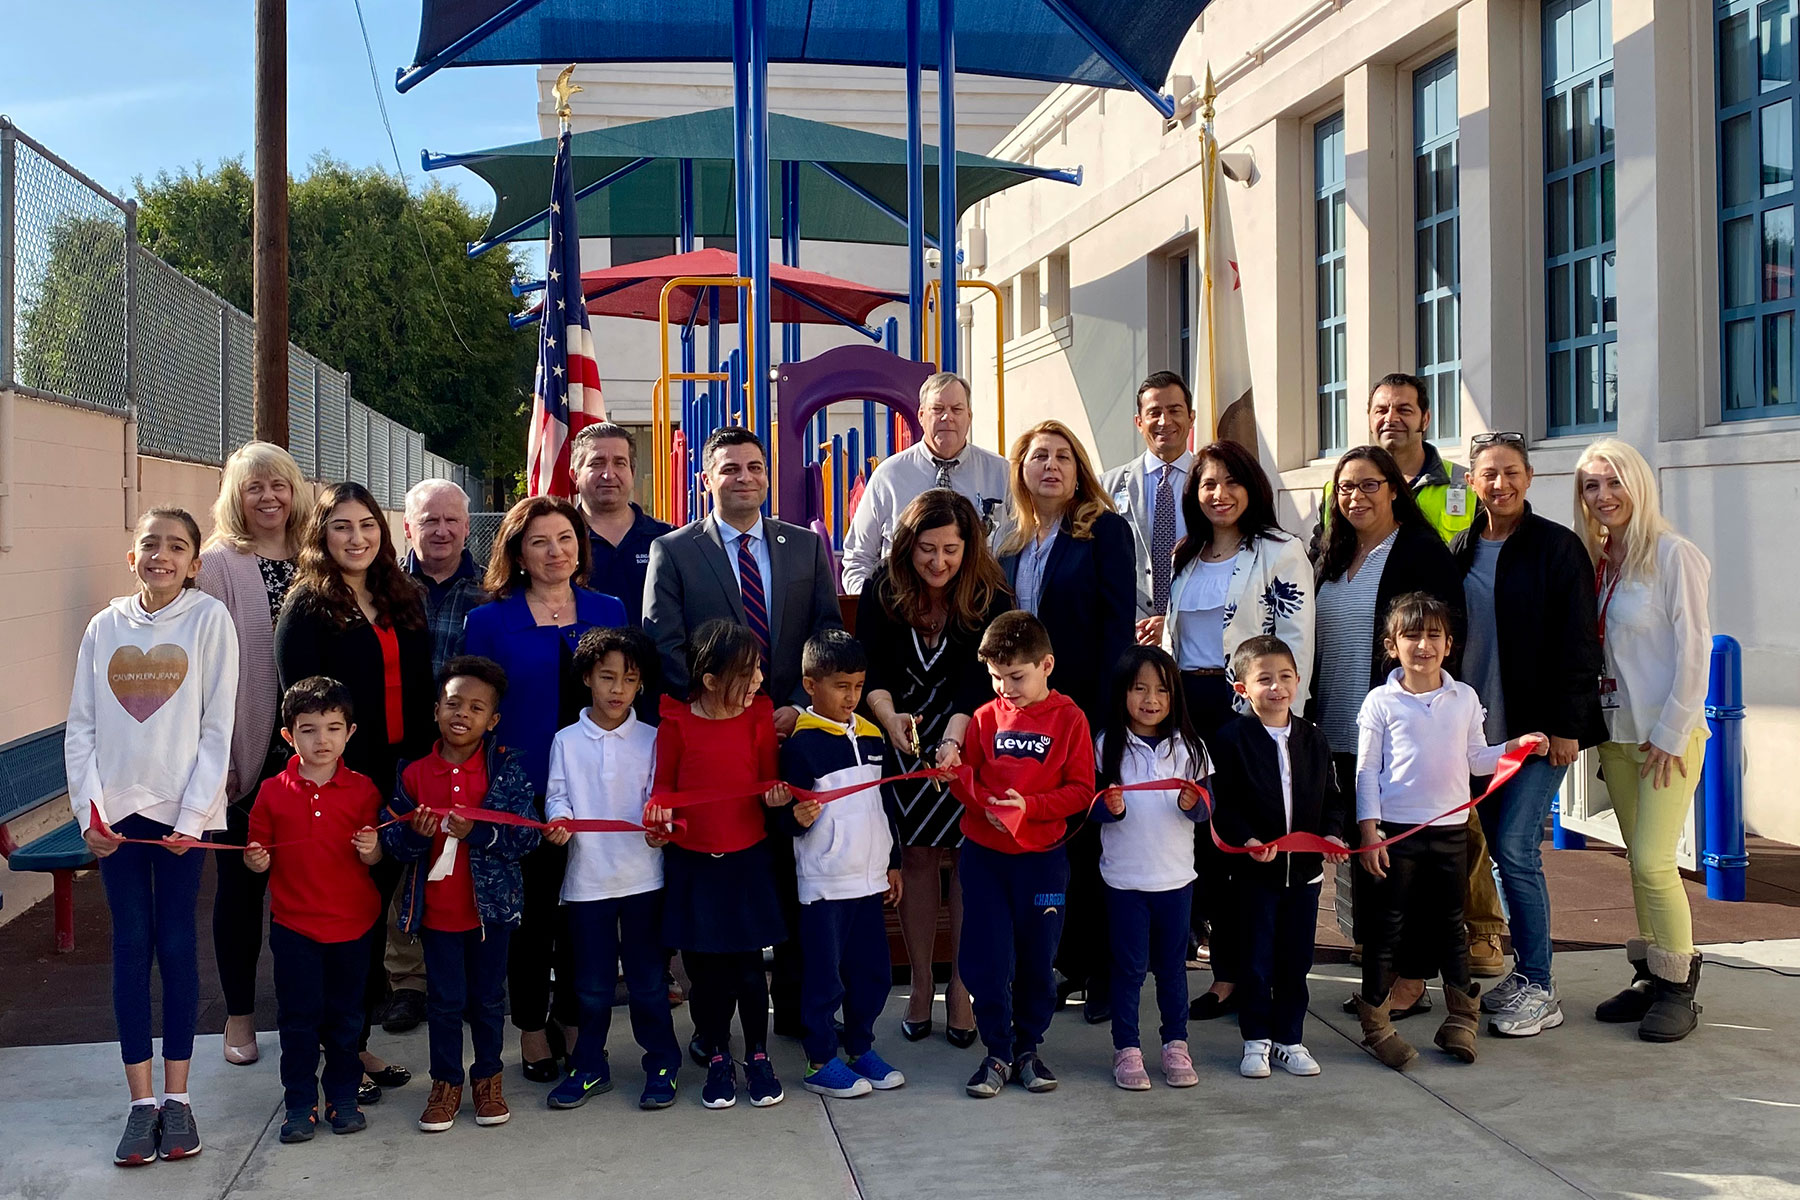 Marshall Elementary School Playground Ribbon Cutting Ceremony